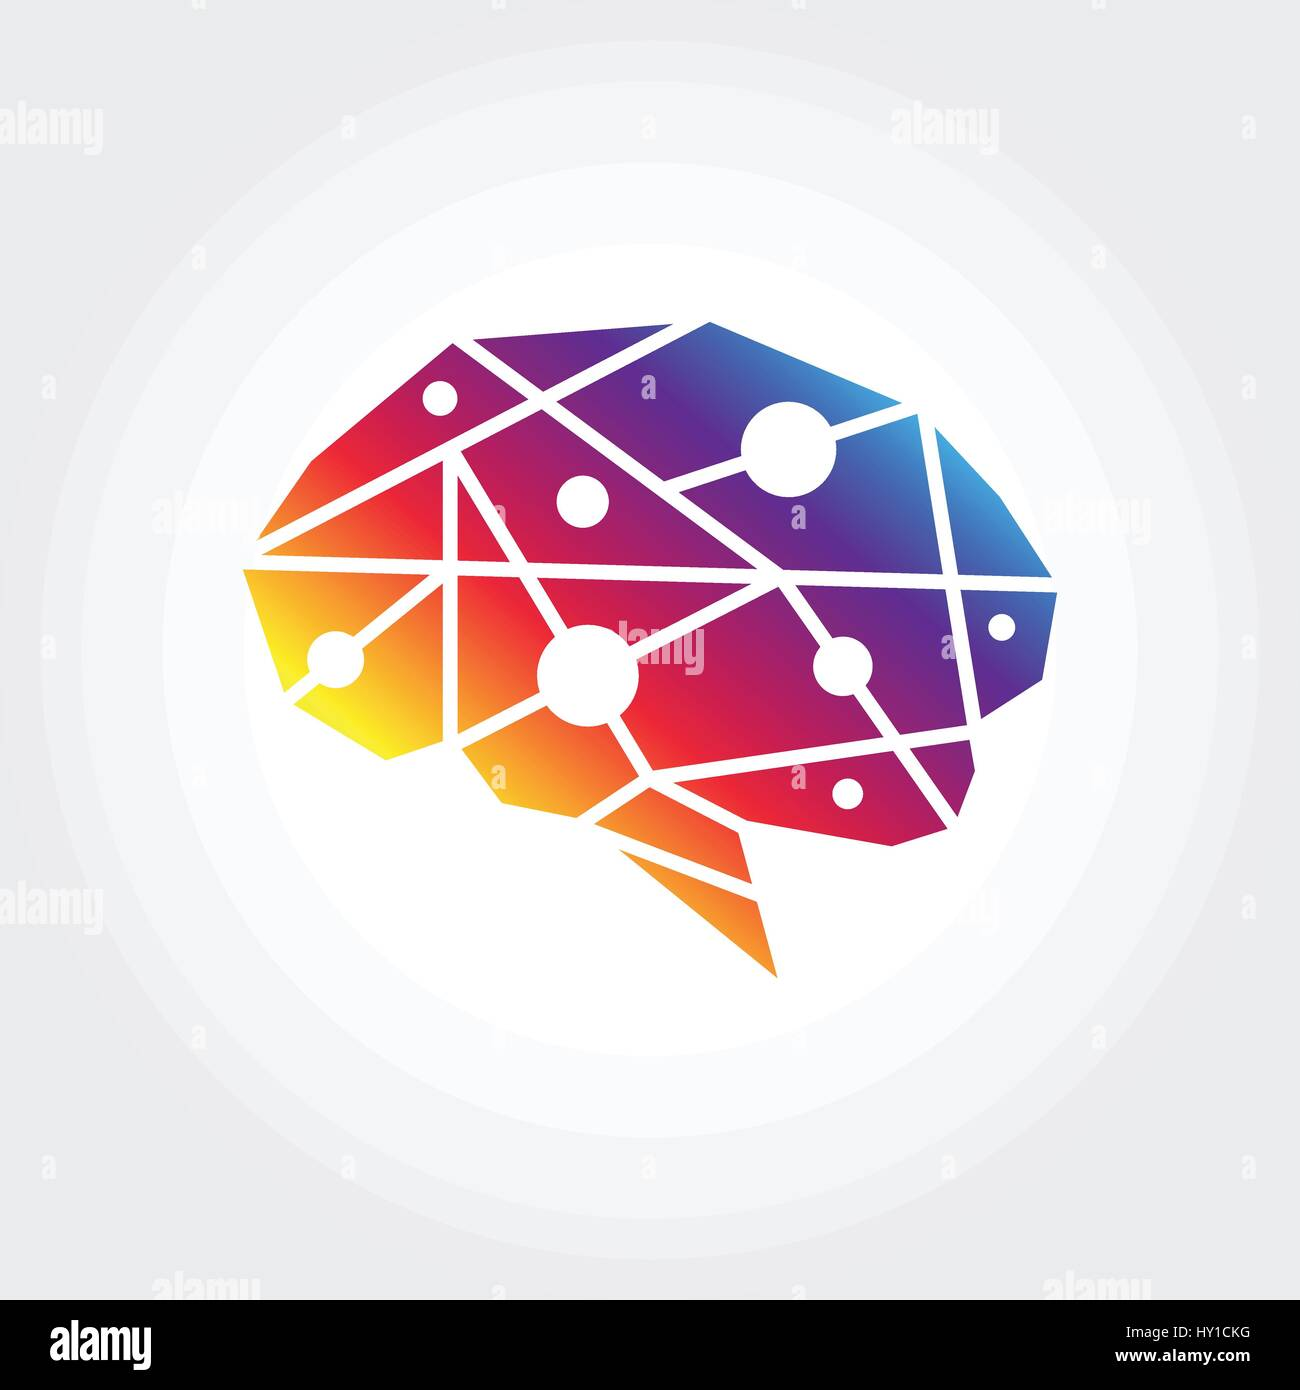 Brain symbol illustration abstract polygon design stock vector art brain symbol illustration abstract polygon design biocorpaavc Images